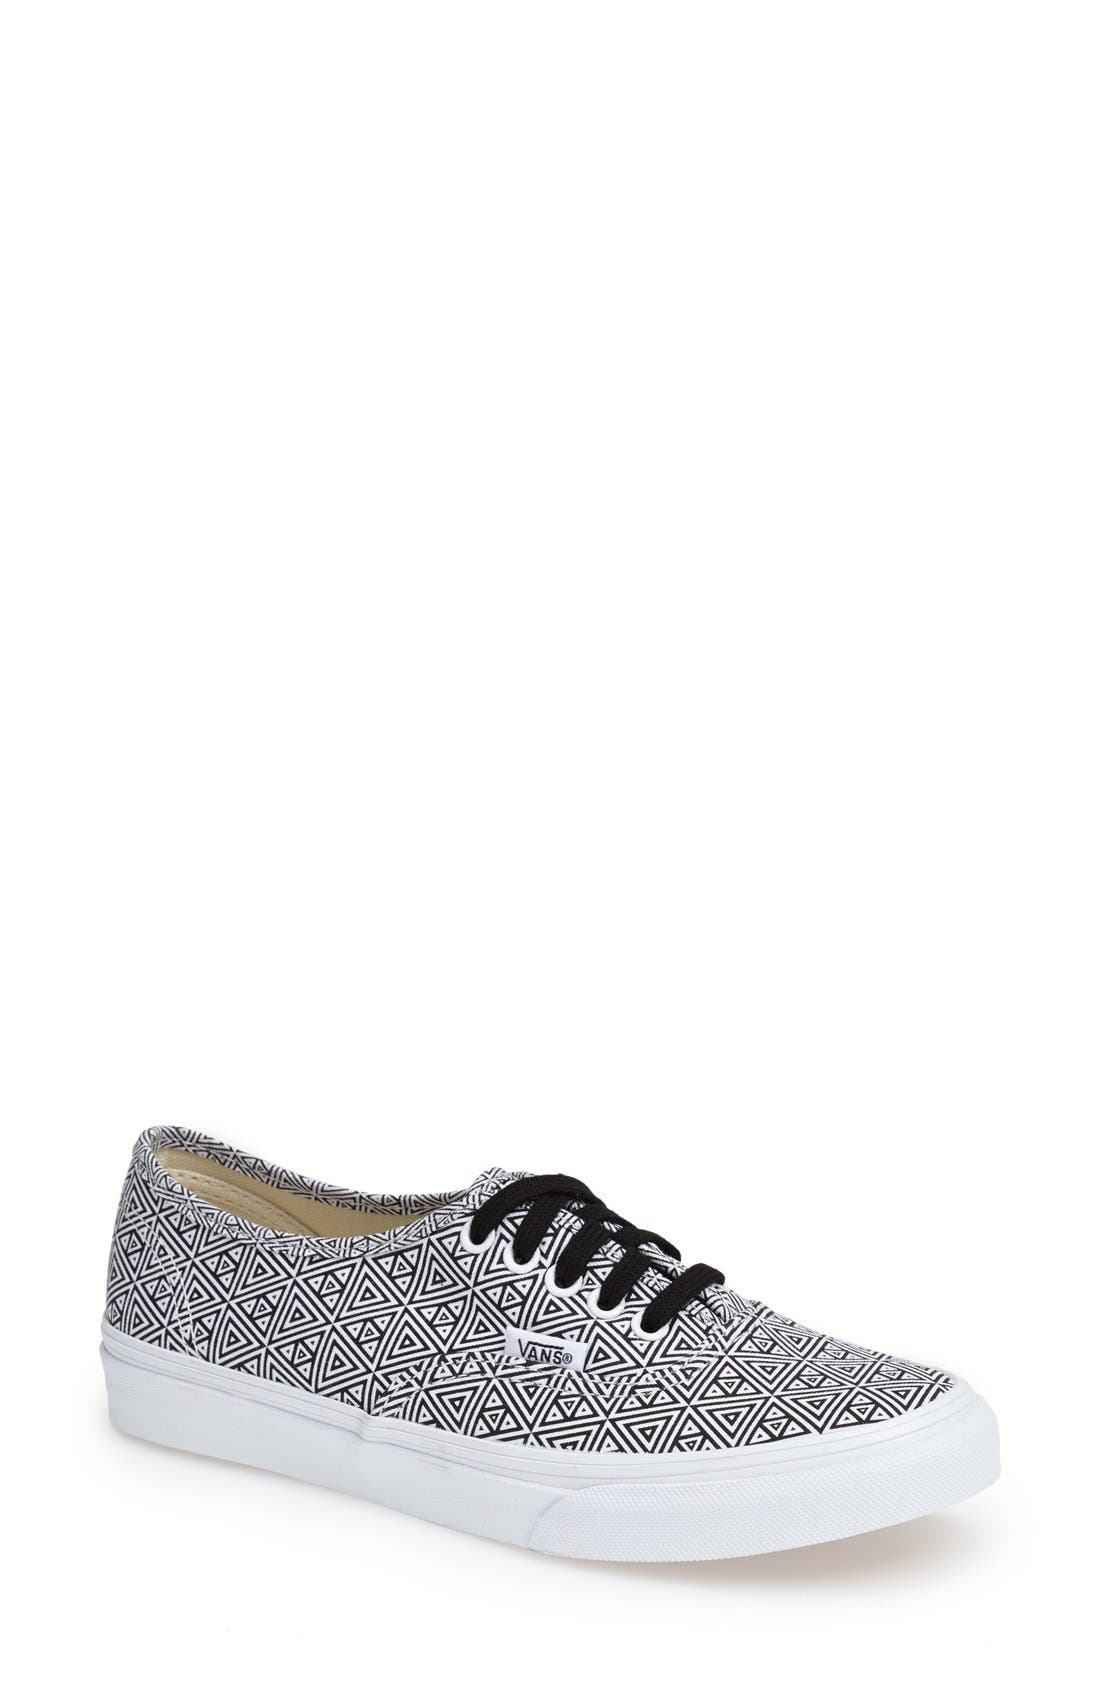 Main Image - Vans 'Authentic Slim' Geo Print Sneaker (Women)